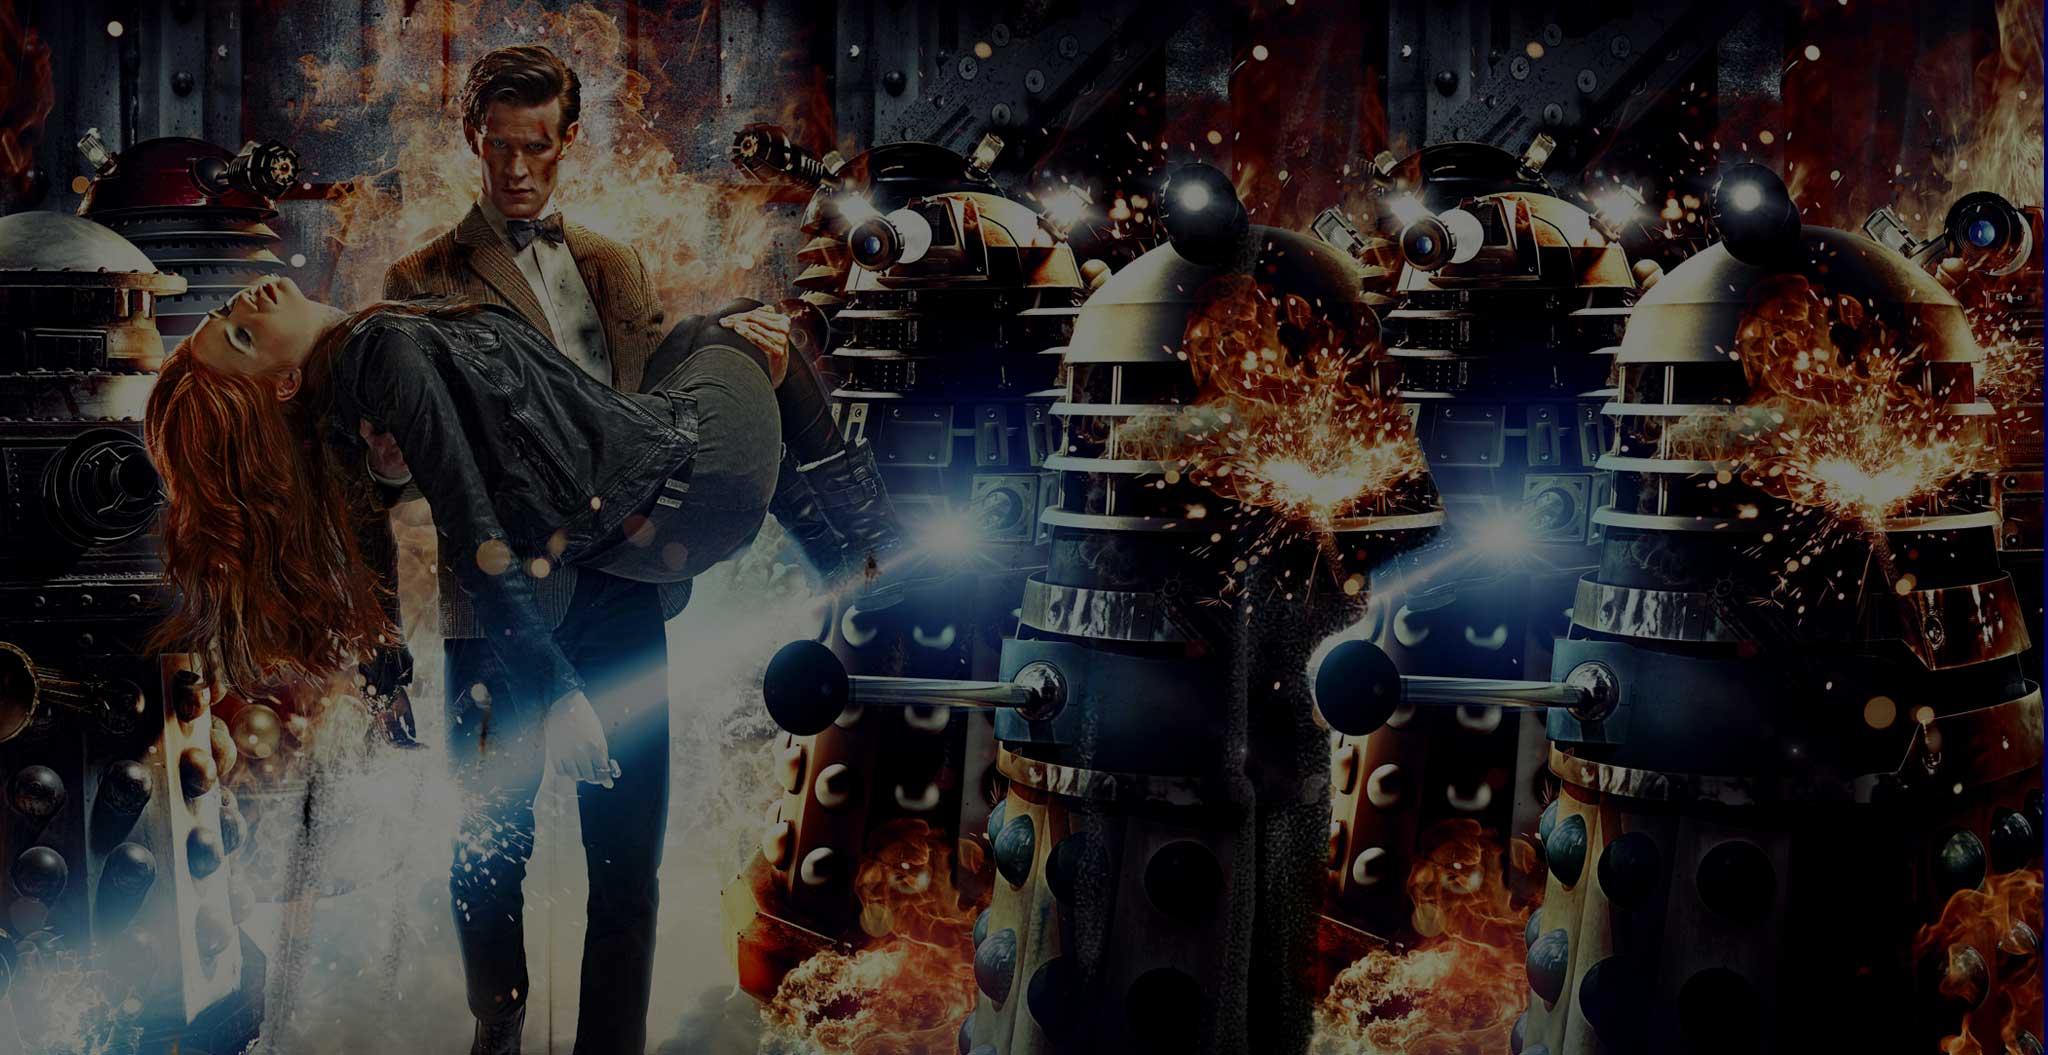 Doctor-Who-Season-7-background.jpg